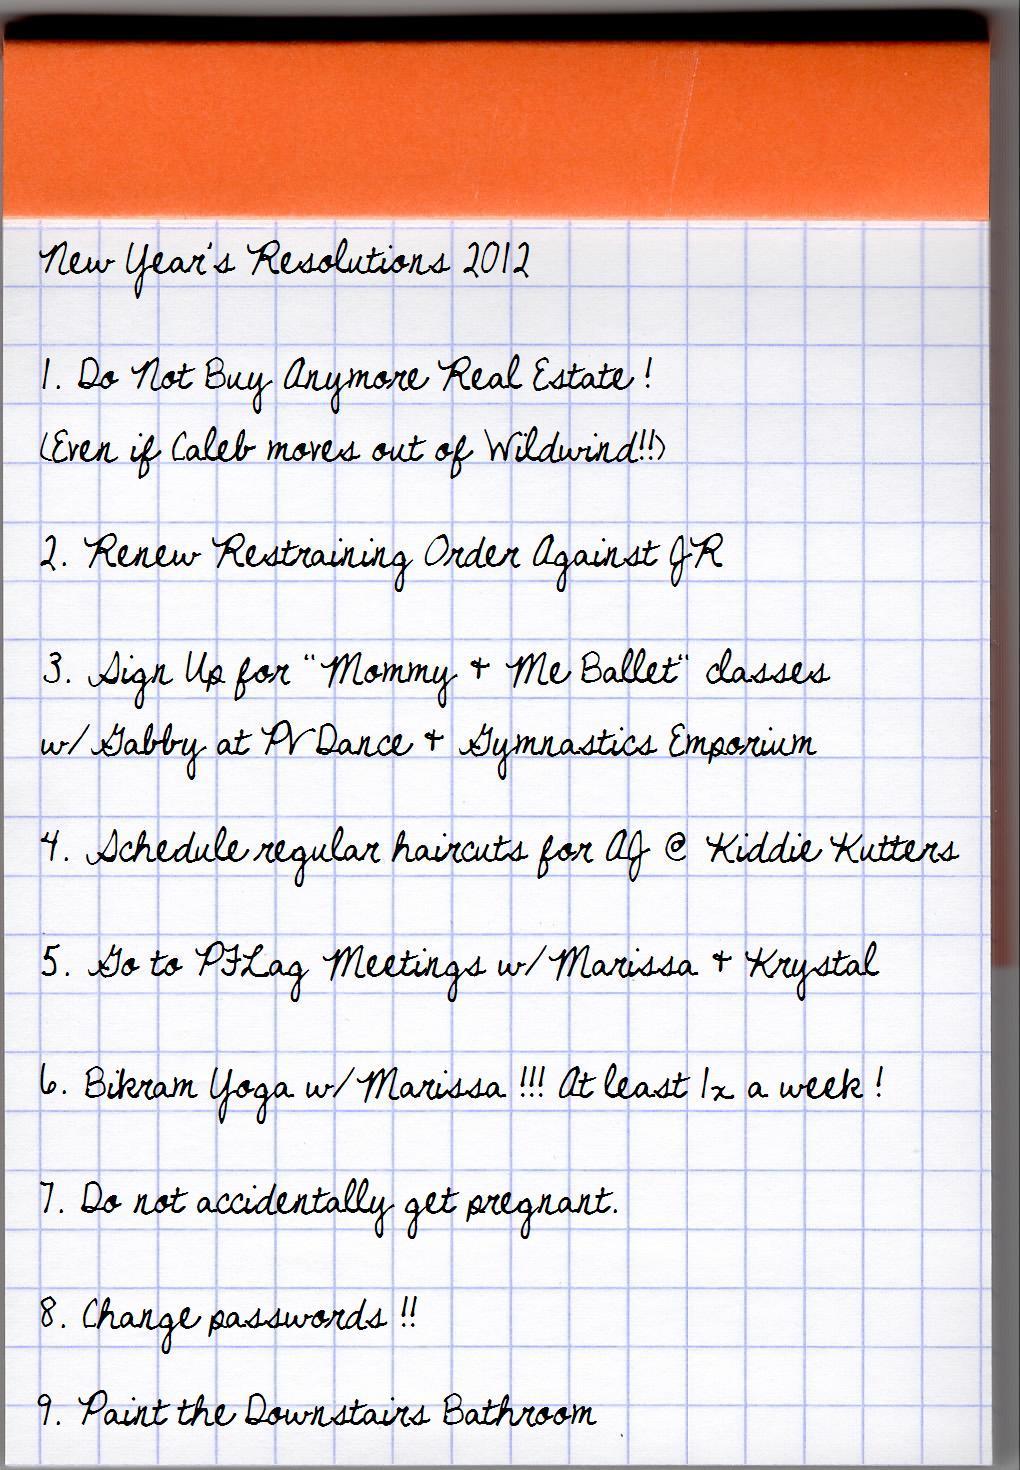 Pratt Falls: Biancapalooza Countdown * New Year's Resolutions?